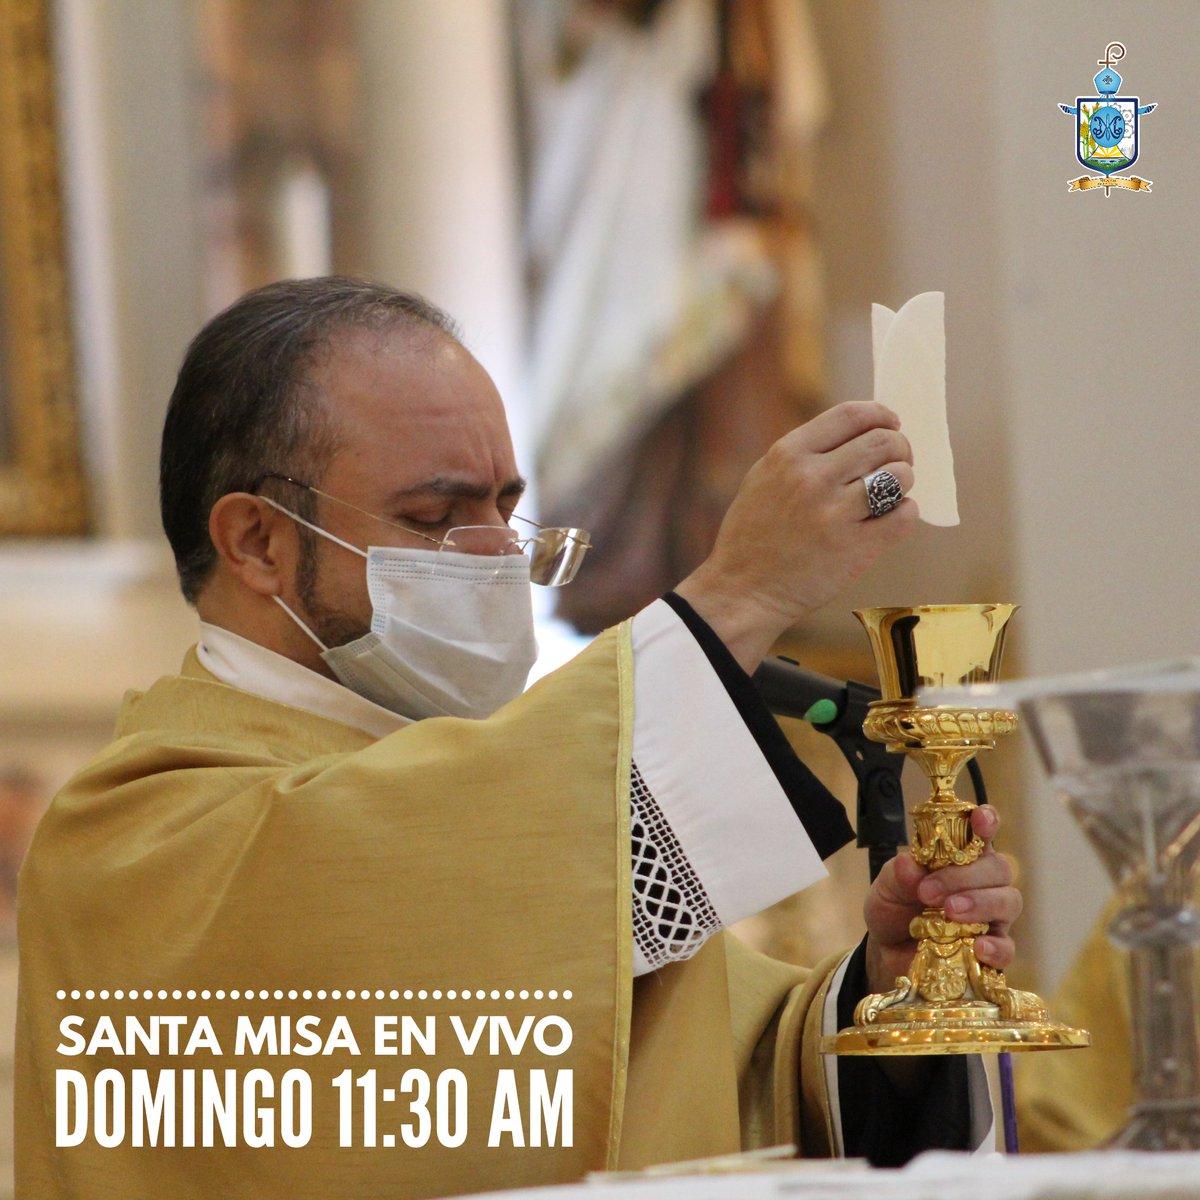 #SantaMisa #EnVivo a través de #Facebook #YouTube de @DiocesisMat   #QuédateEnCasa #Dios #Tamaulipas #FelizDomingo https://t.co/oSJIXfIYWQ